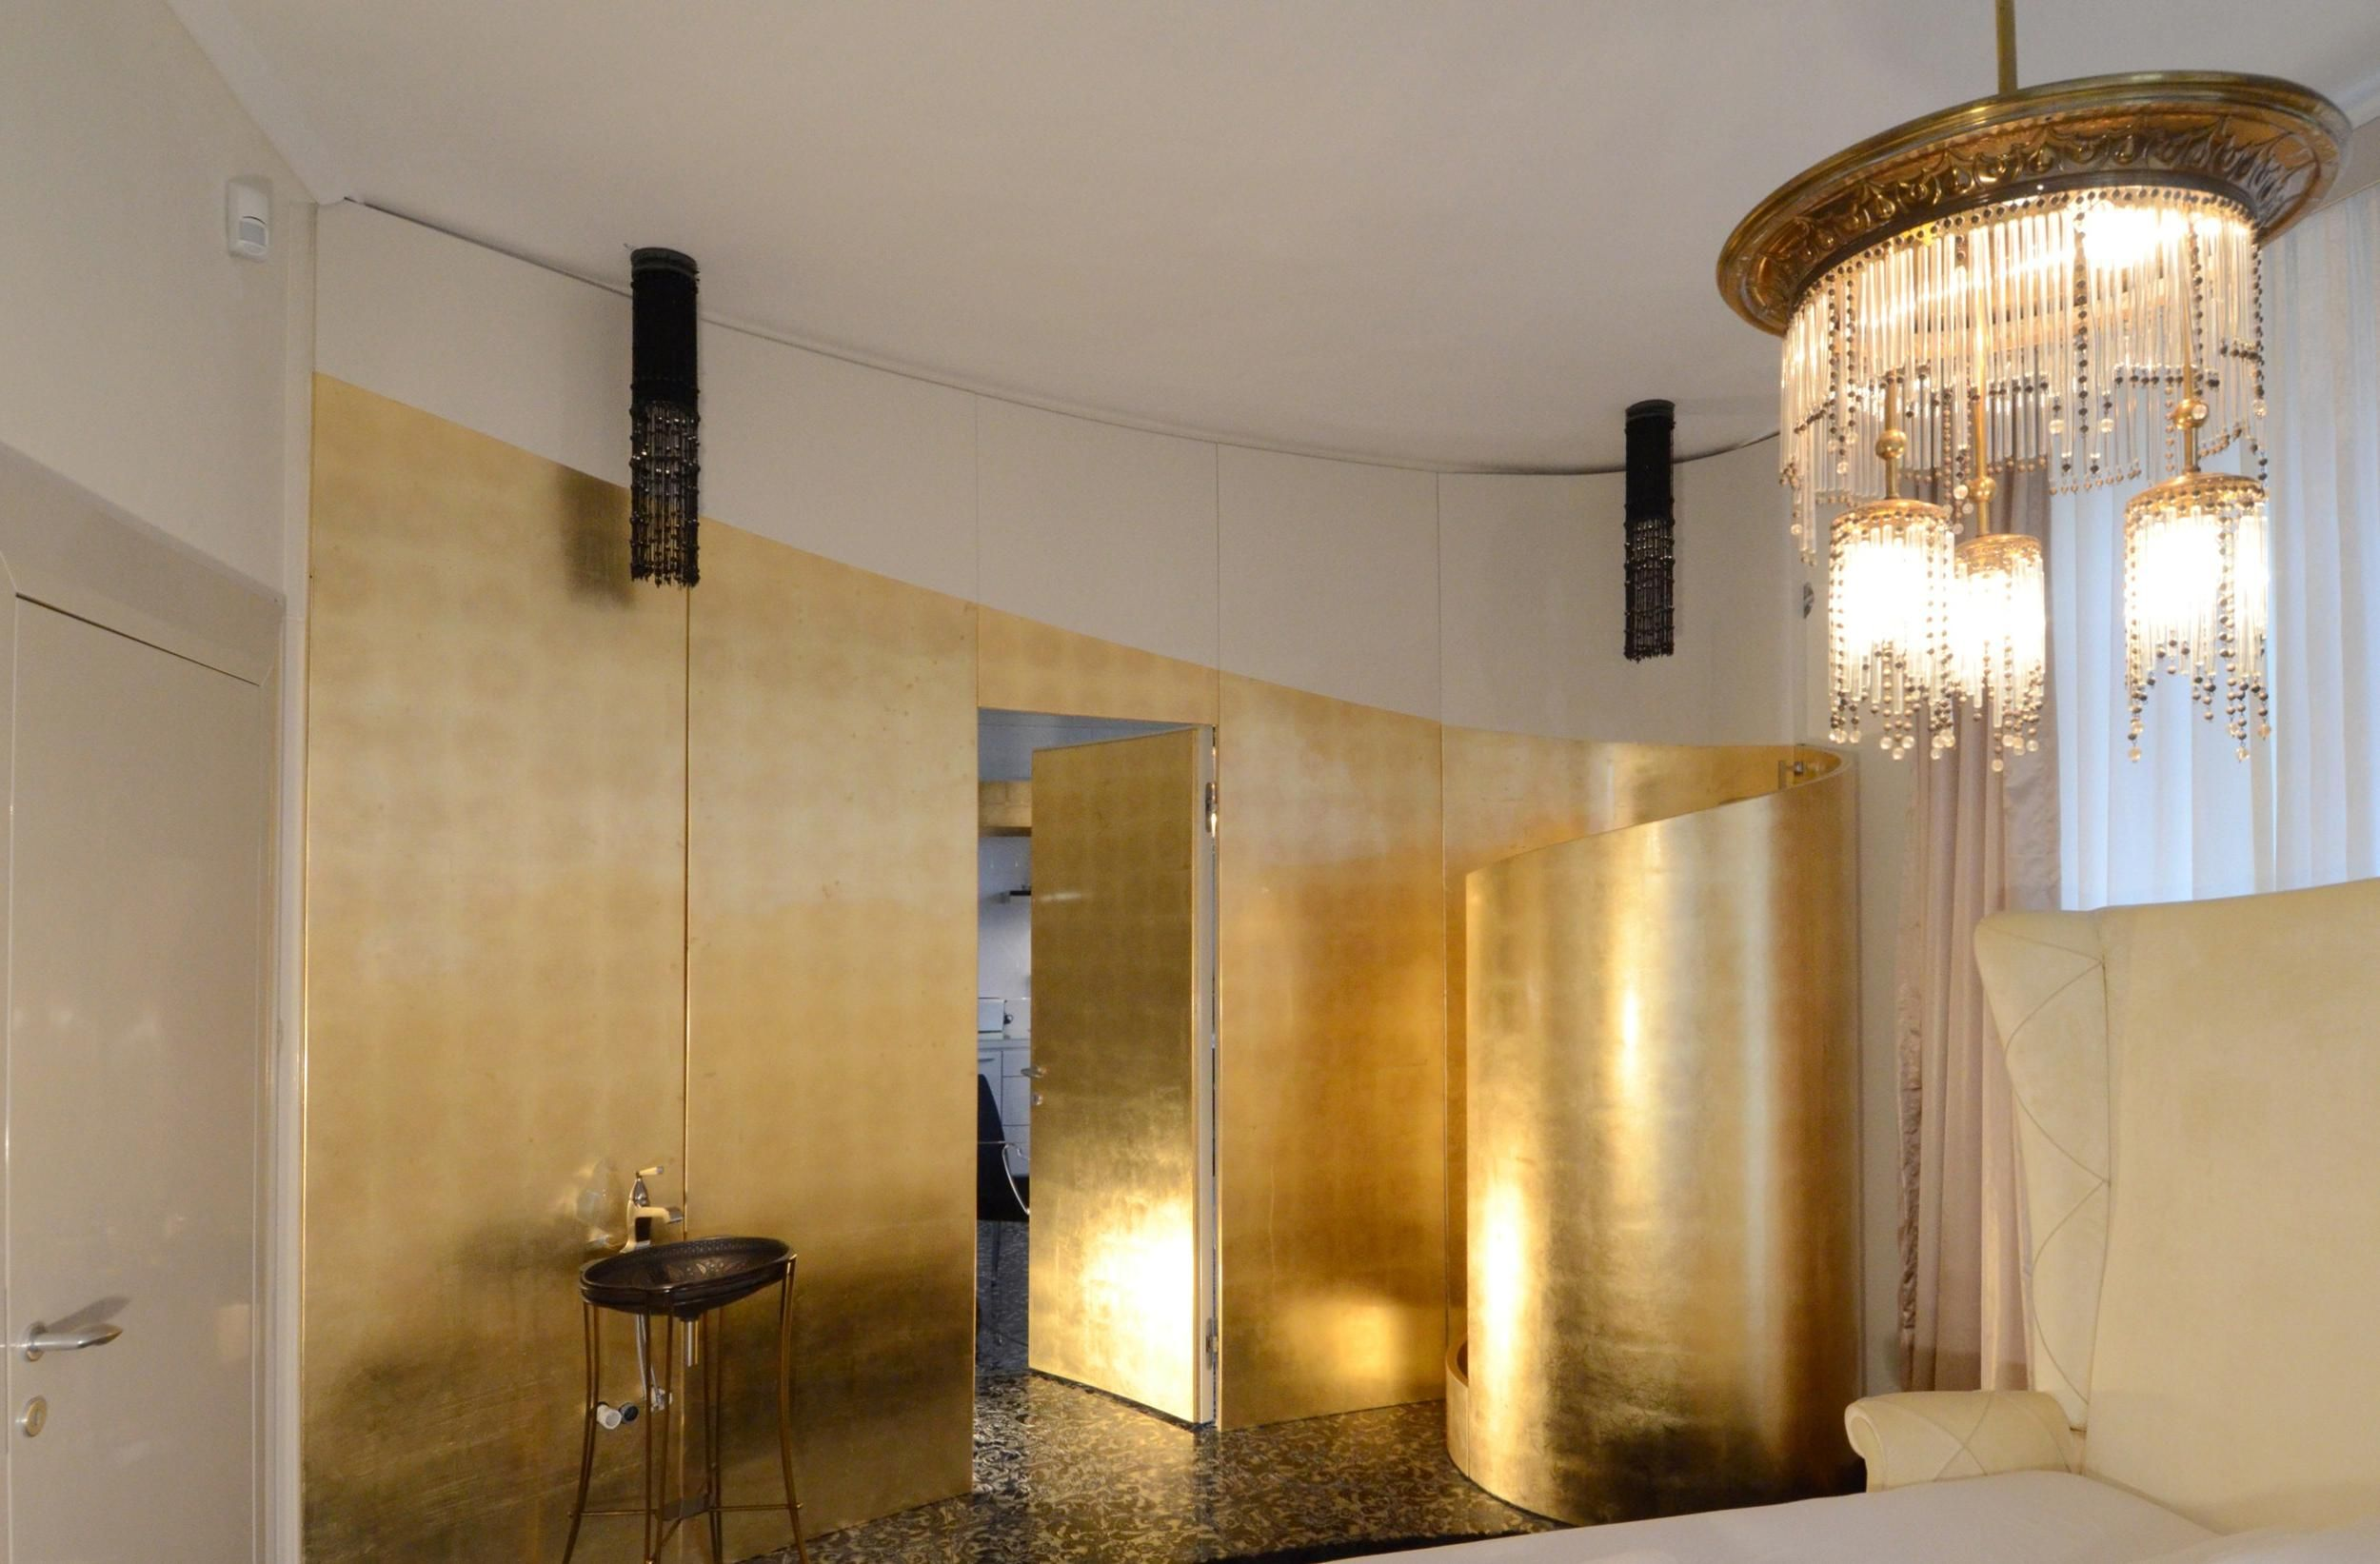 Enchanting bathroom decoration ideas with luxury pendant lamps as enchanting bathroom decoration ideas with luxury pendant lamps as well gold paint wall and showr corner aloadofball Choice Image